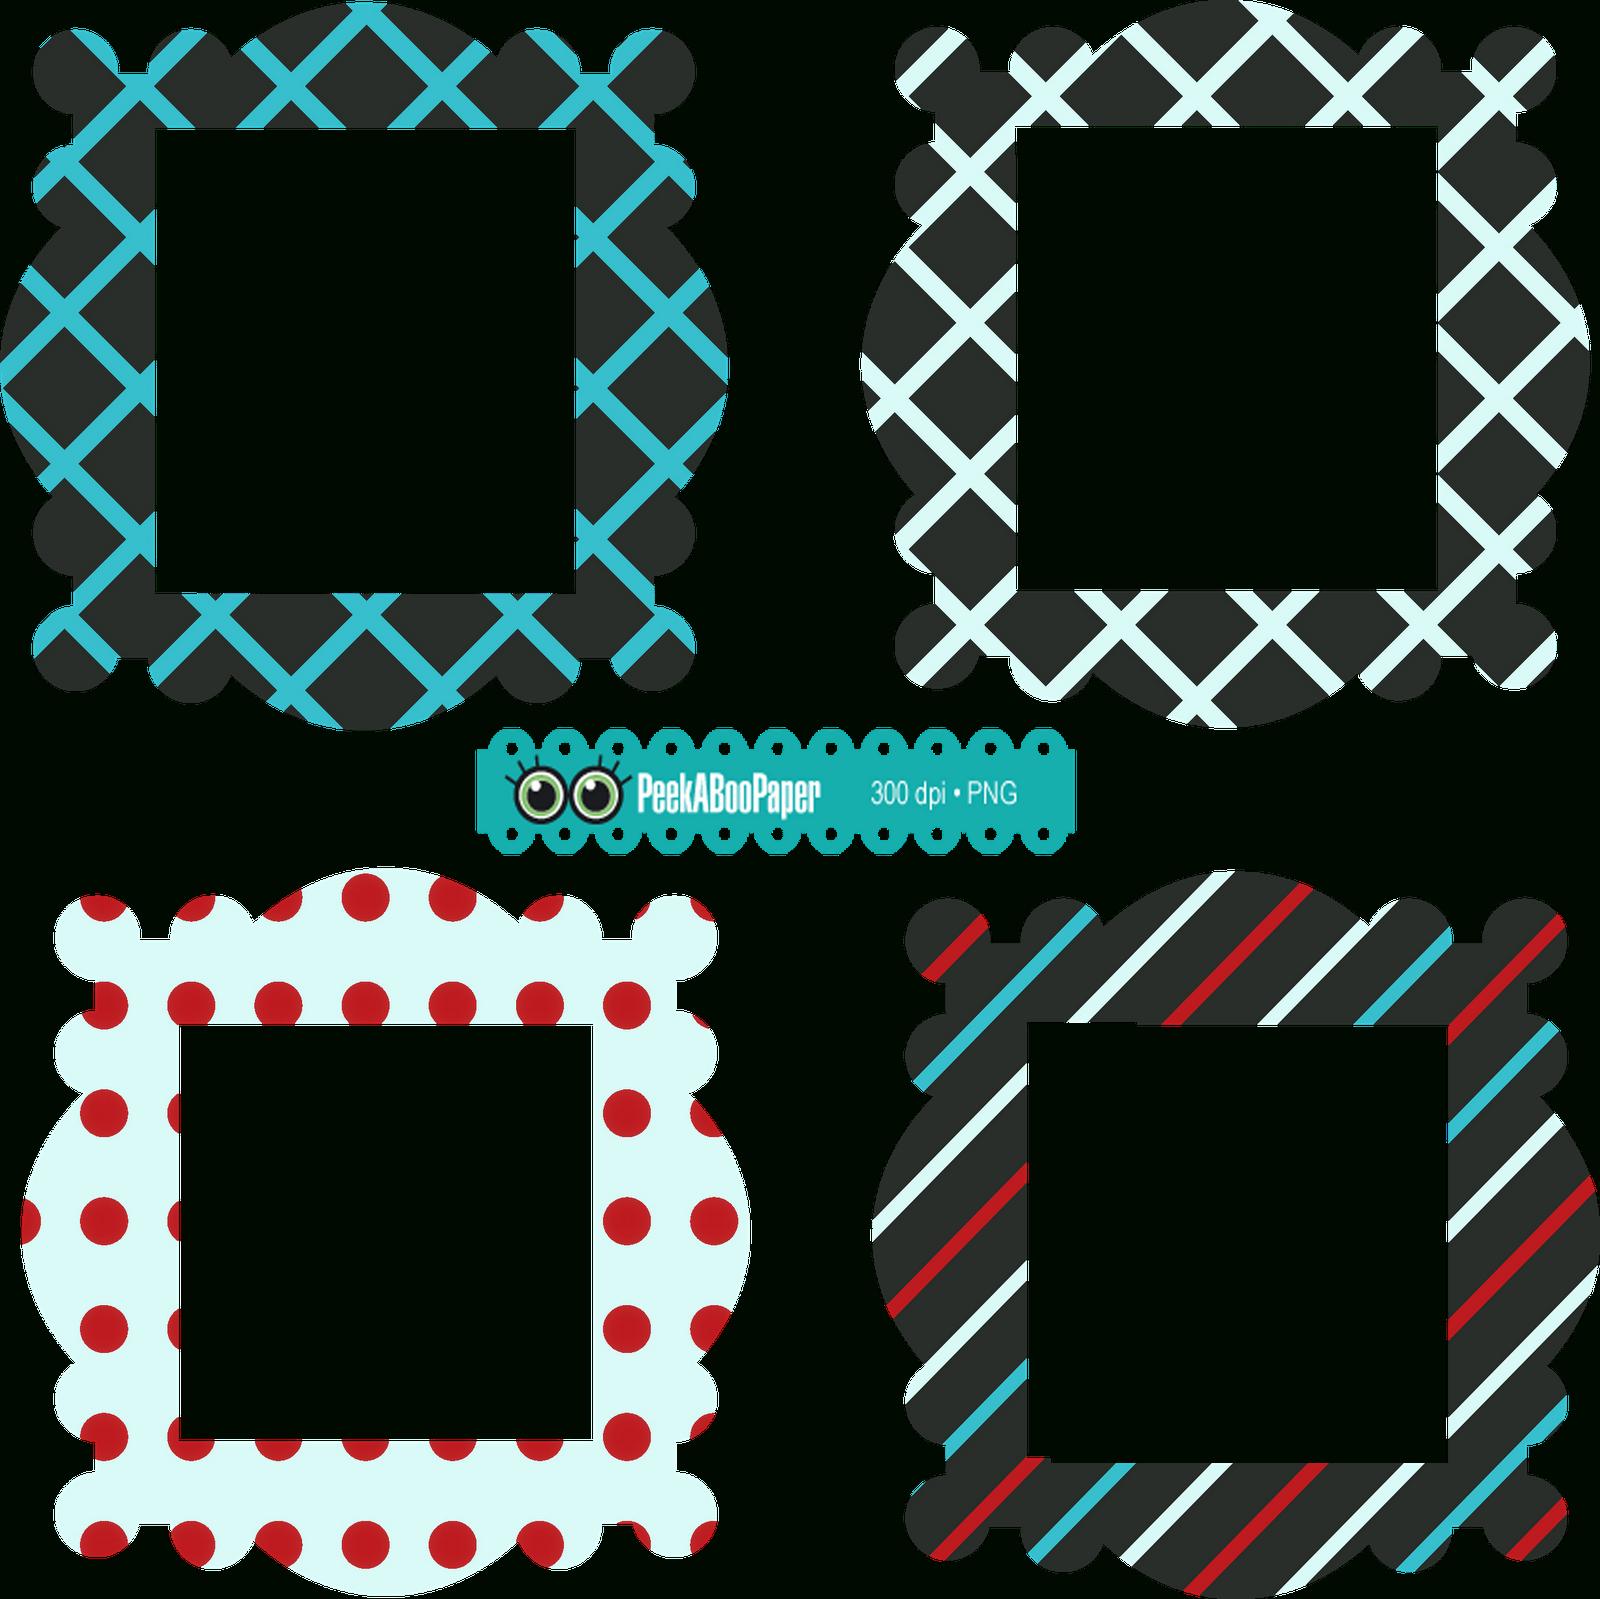 Free+Printable+Scrapbooking+Scrapbook+Frames   Sticker Charts - Free Printable Frames For Scrapbooking